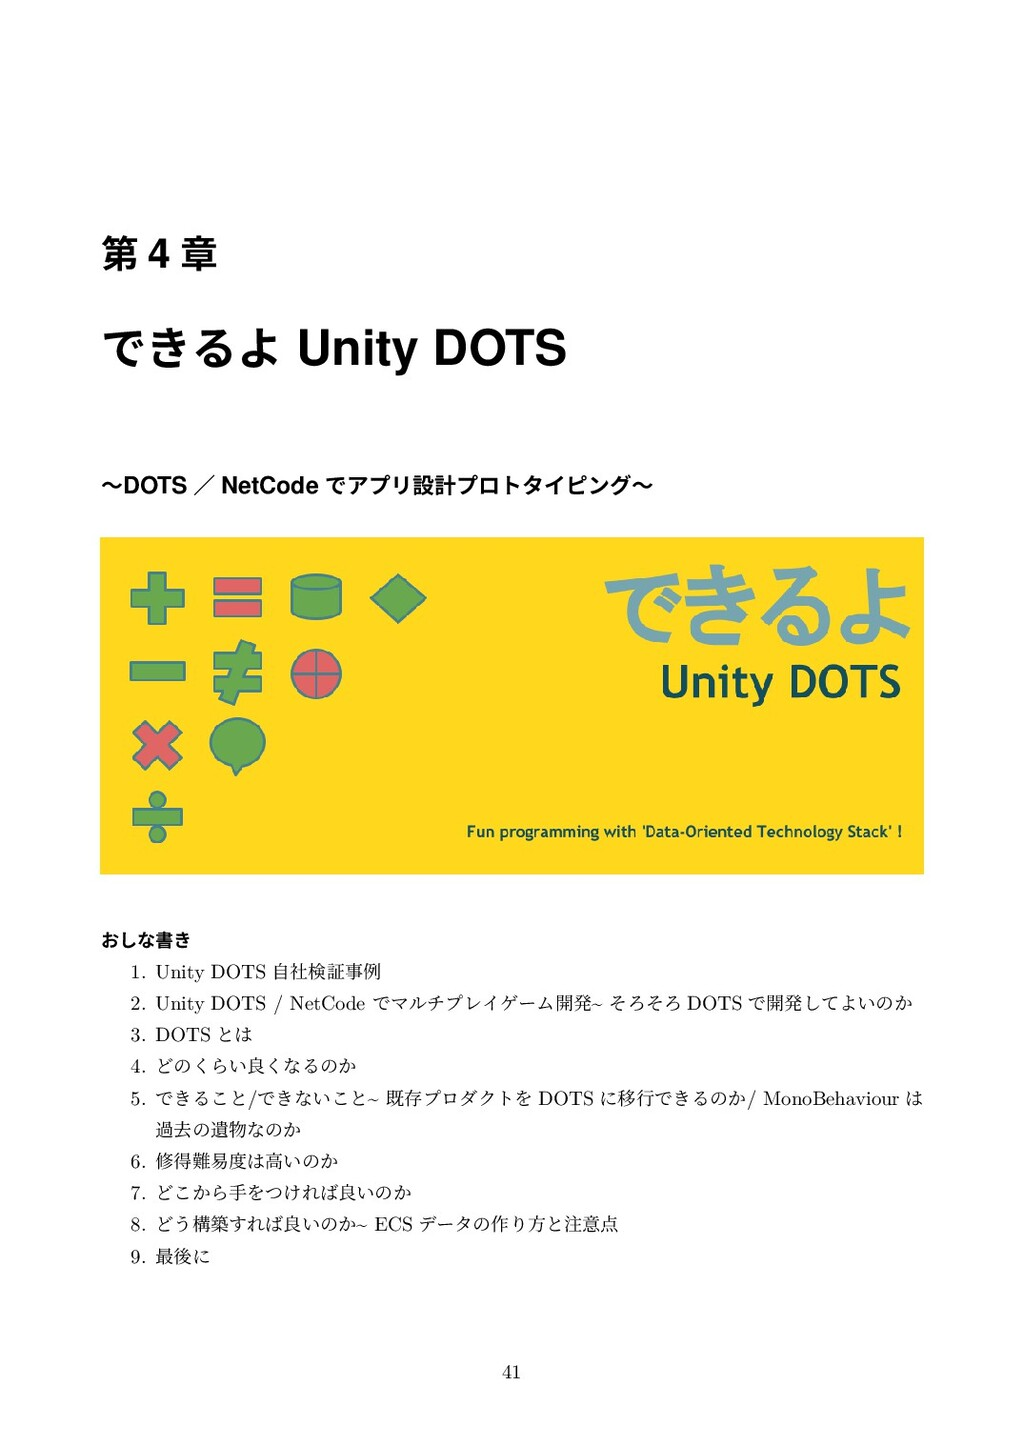 ୈ 4 ষ Ͱ͖ΔΑ Unity DOTS ʙDOTS ʗ NetCode ͰΞϓϦઃܭϓϩτ...